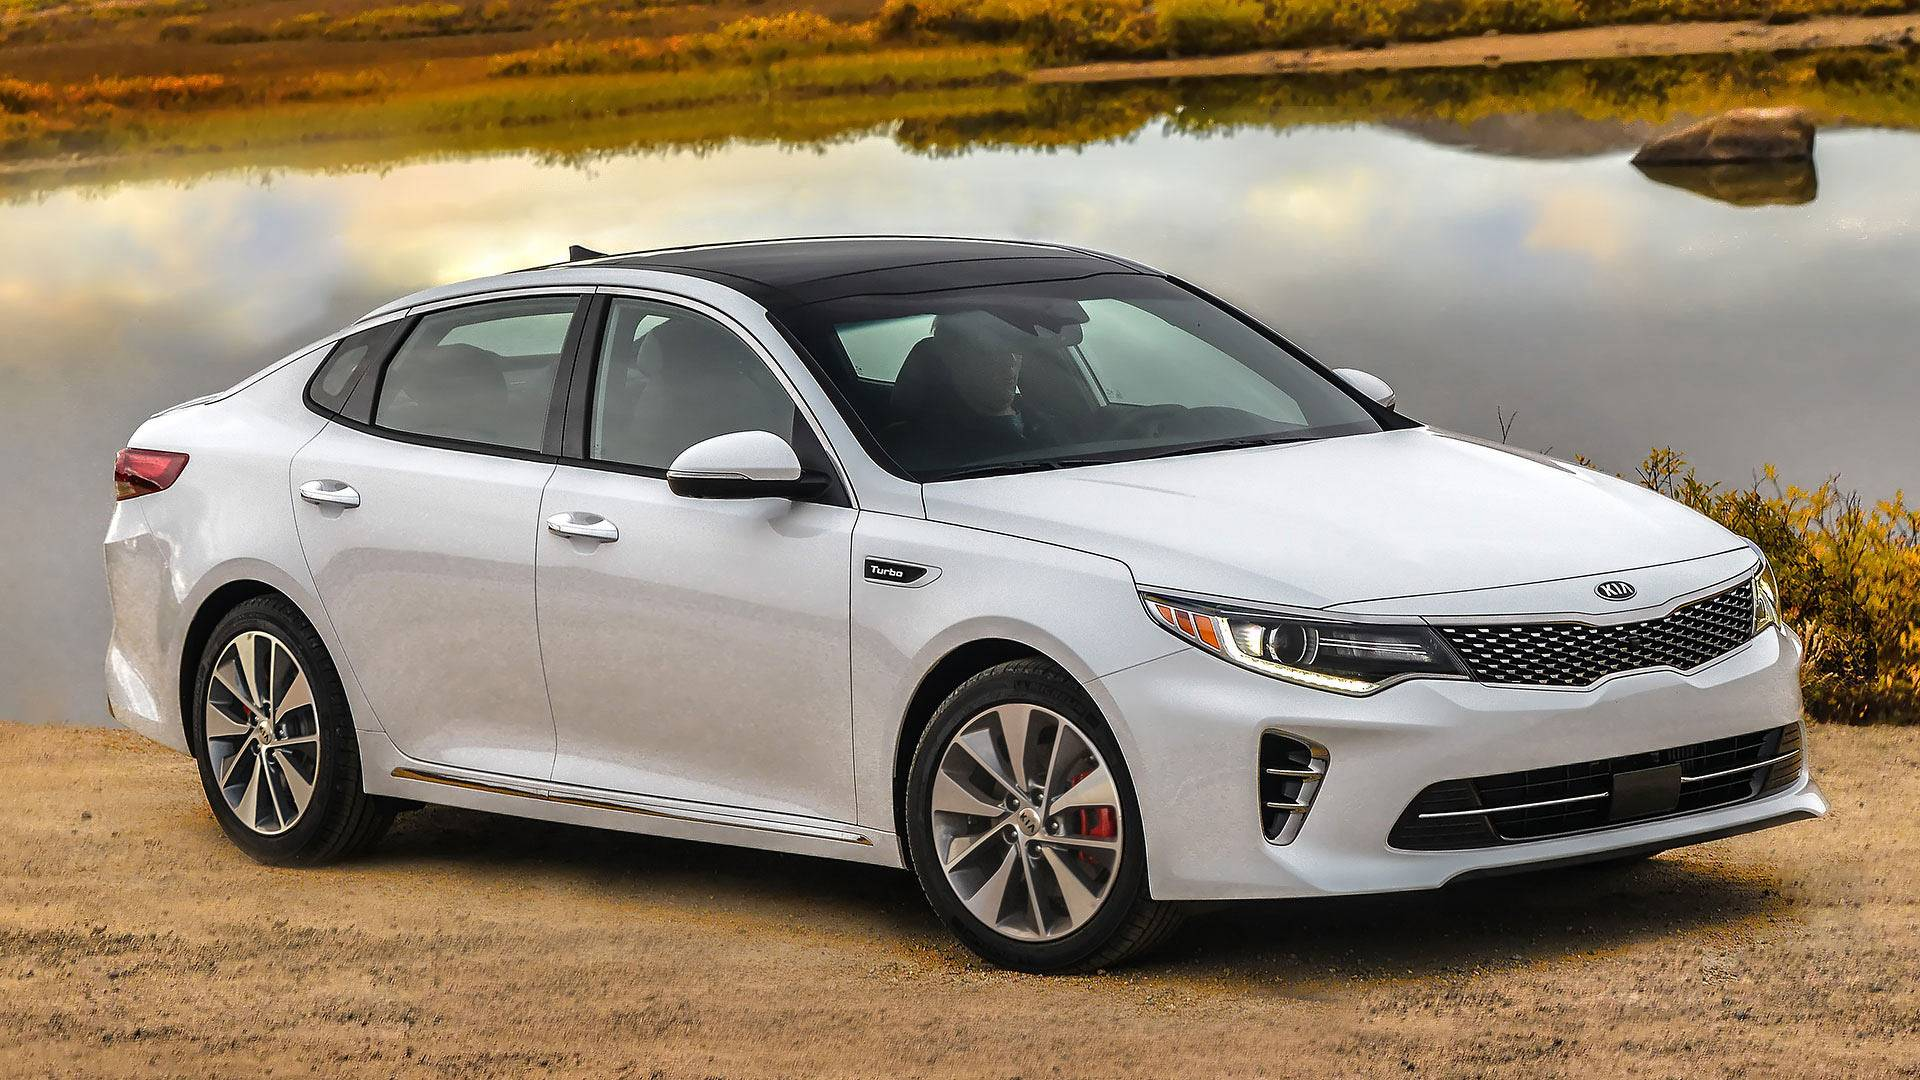 optima cars ex reviews kia and motor rating trend